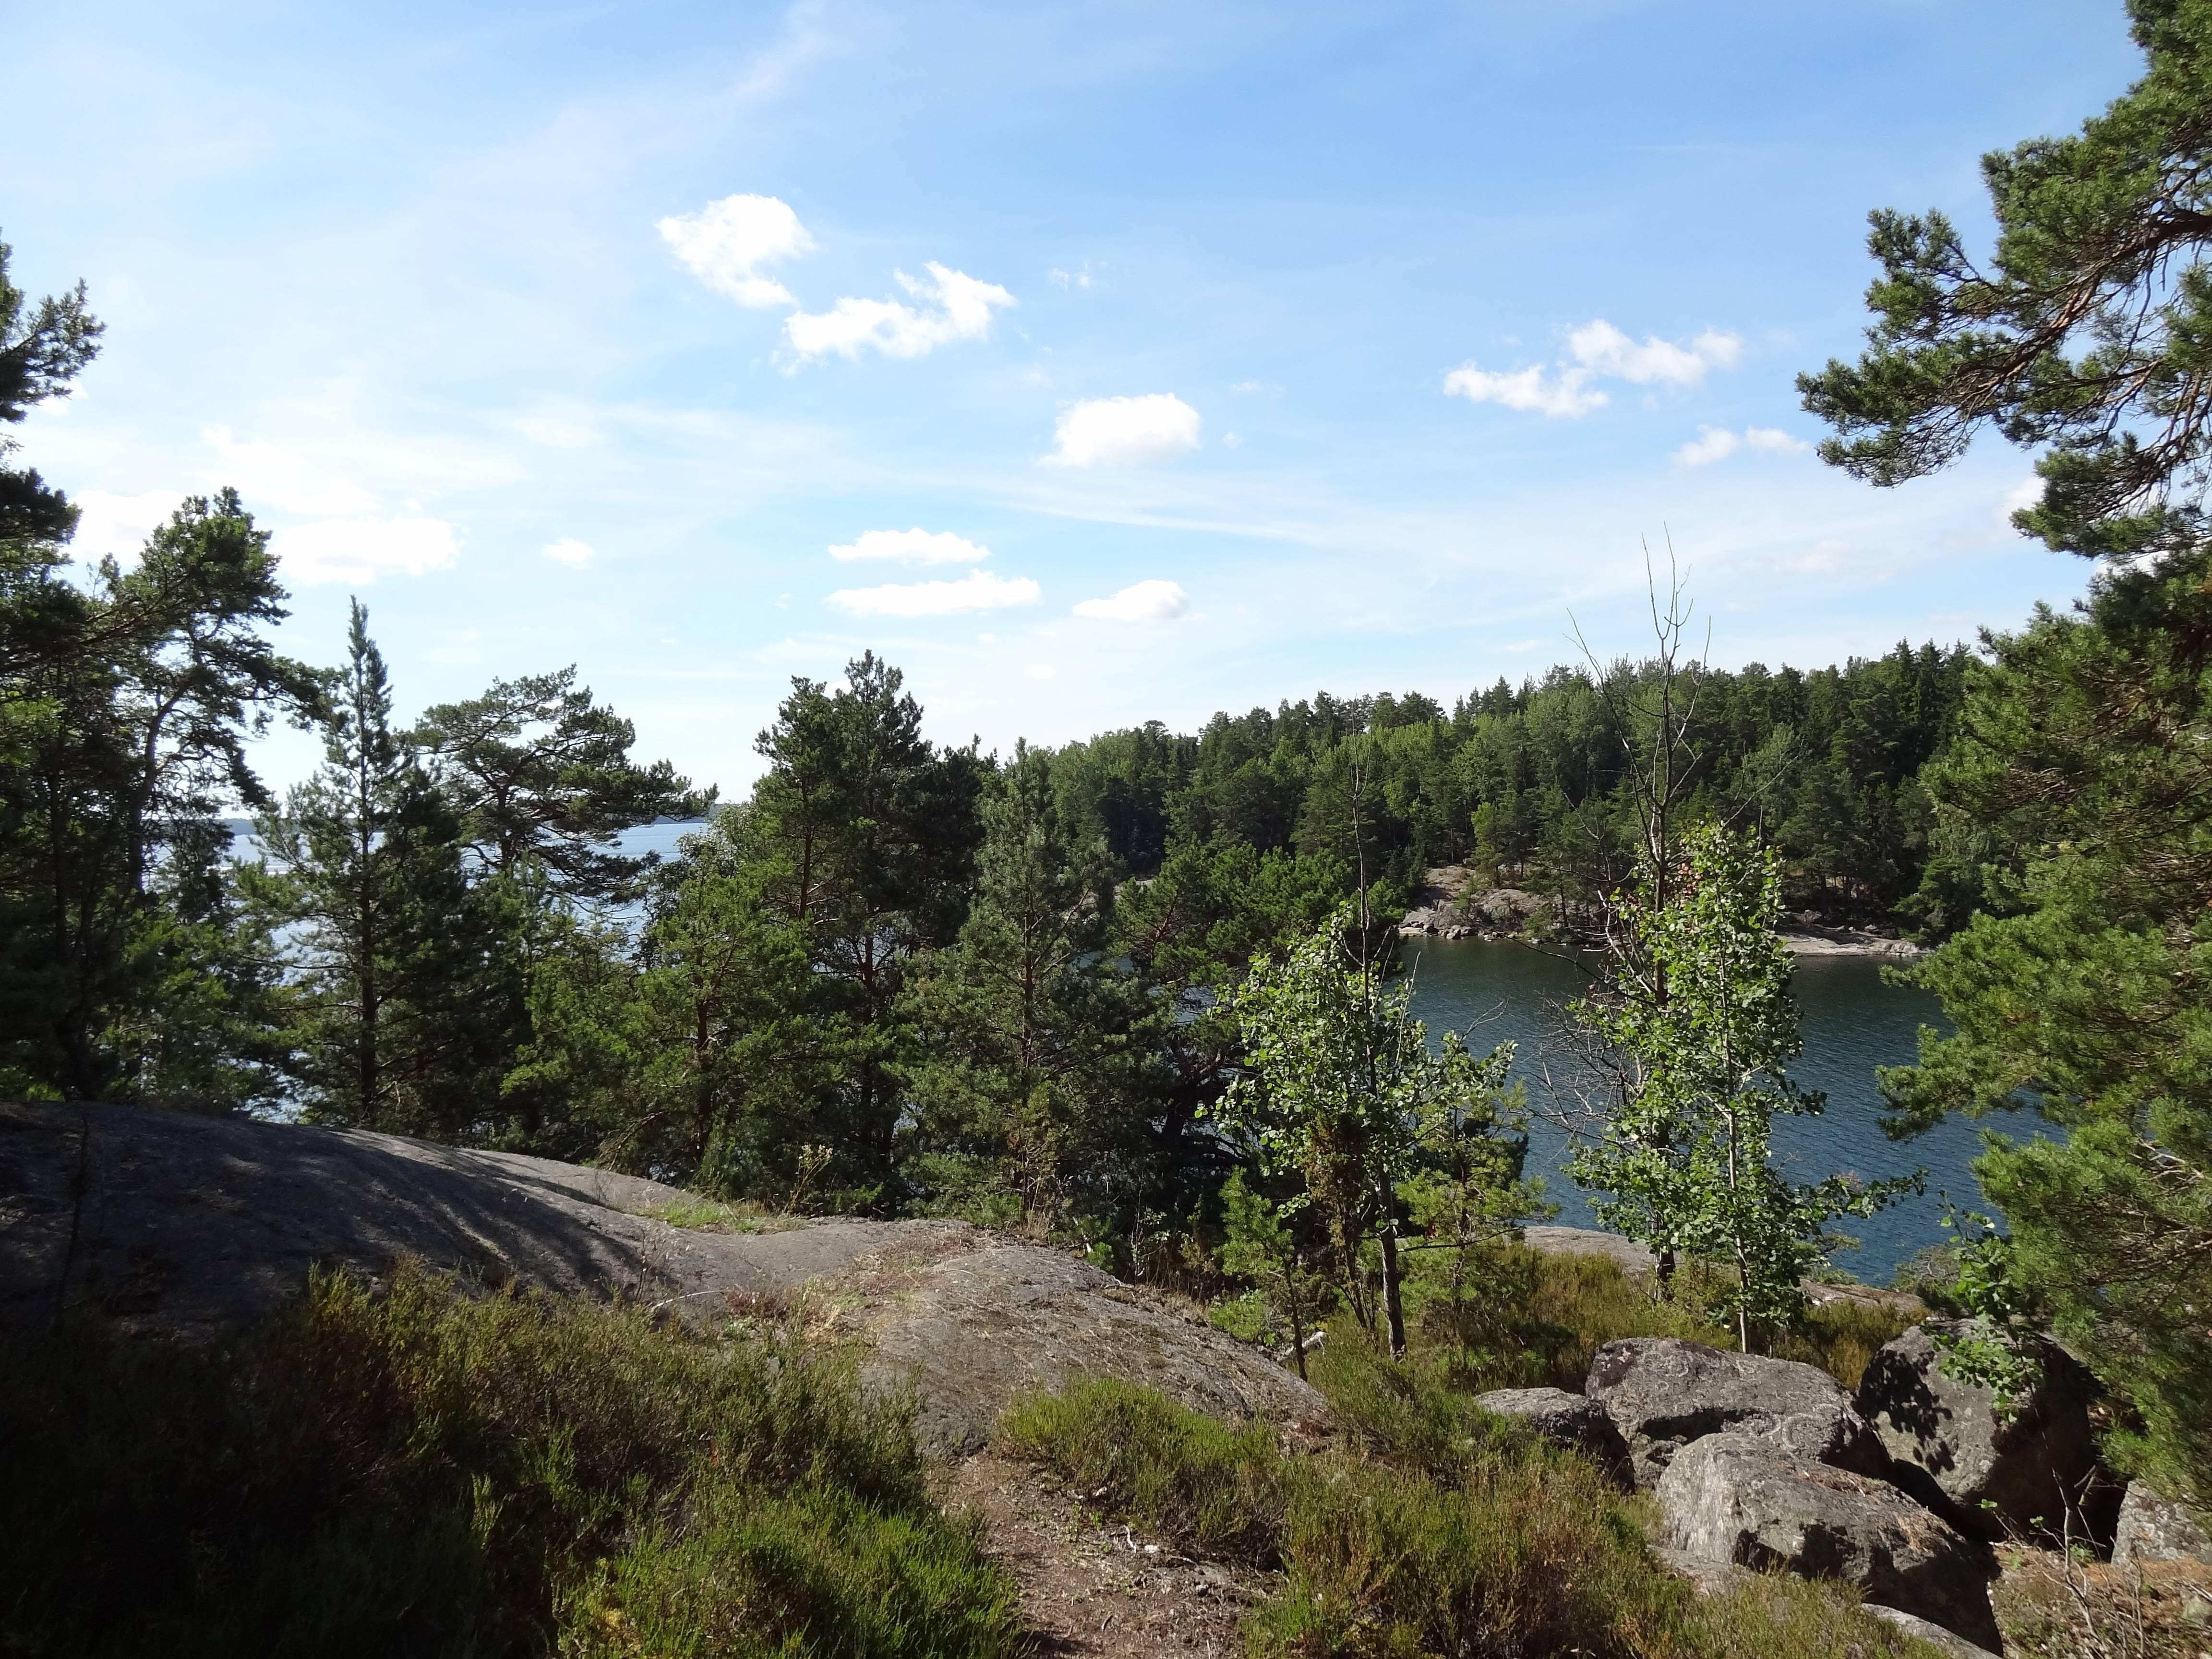 Photo 1: Ile de Grinda, Suède